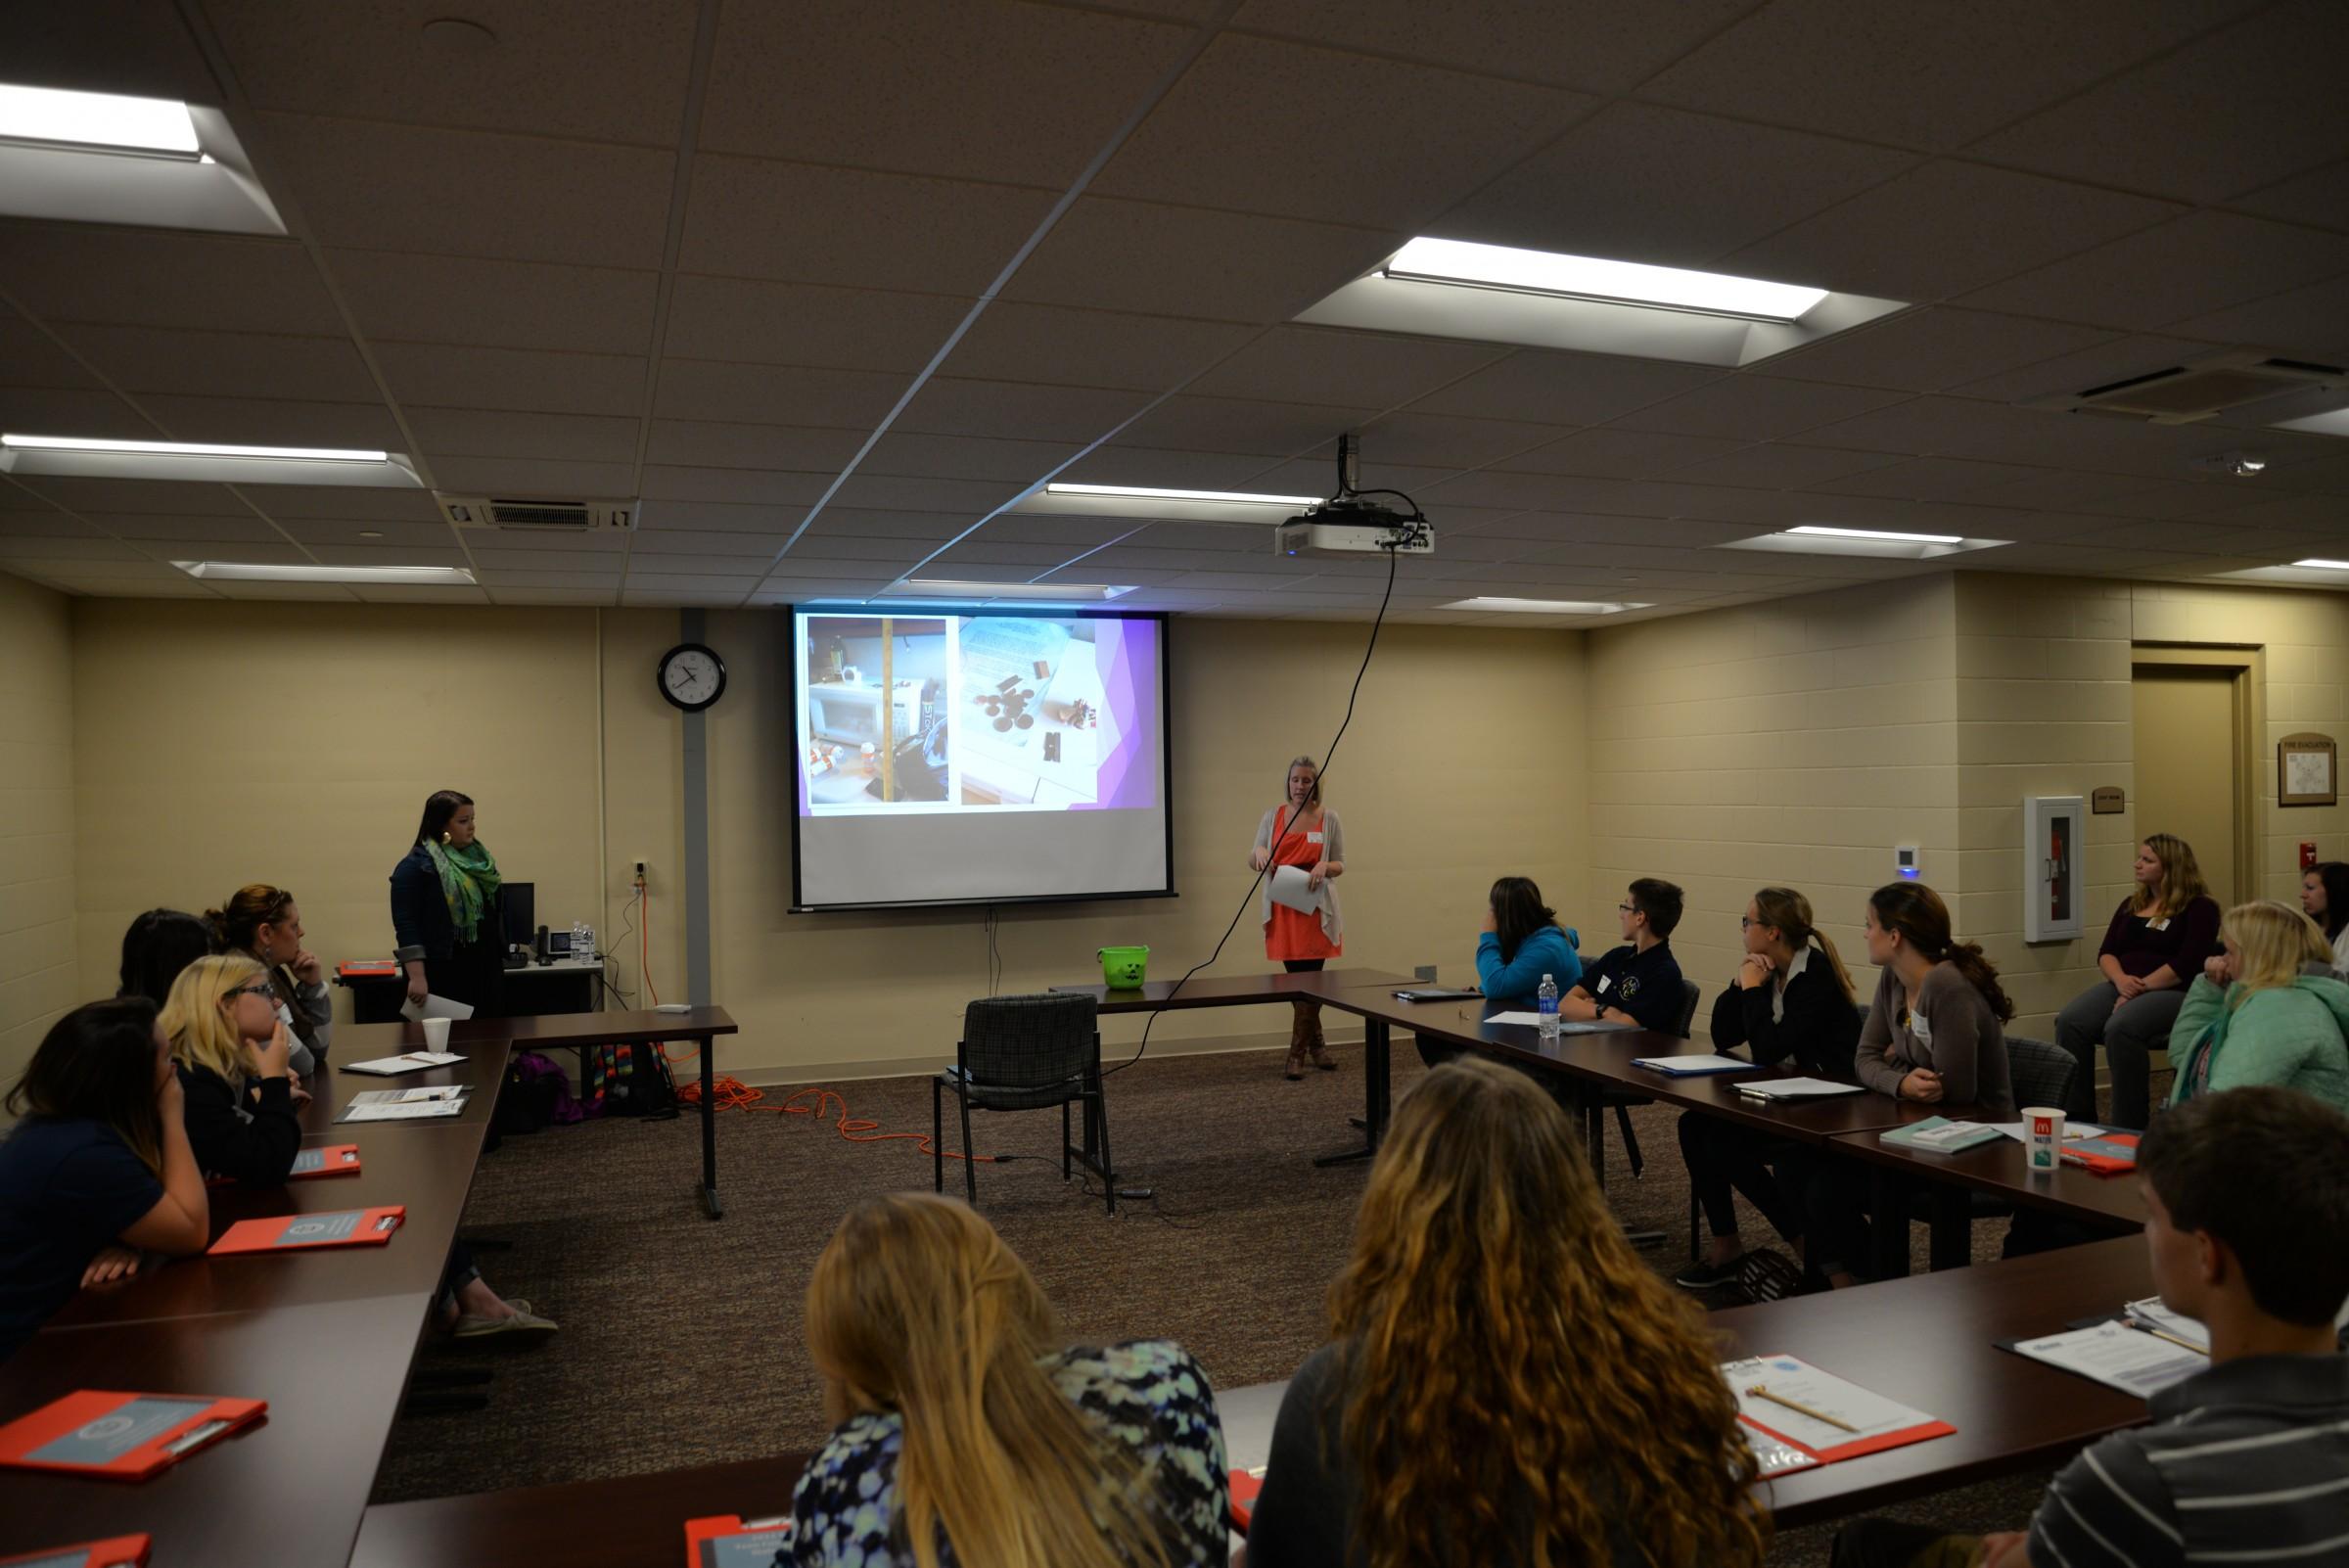 Meet Teen court coordinator to discuss the average